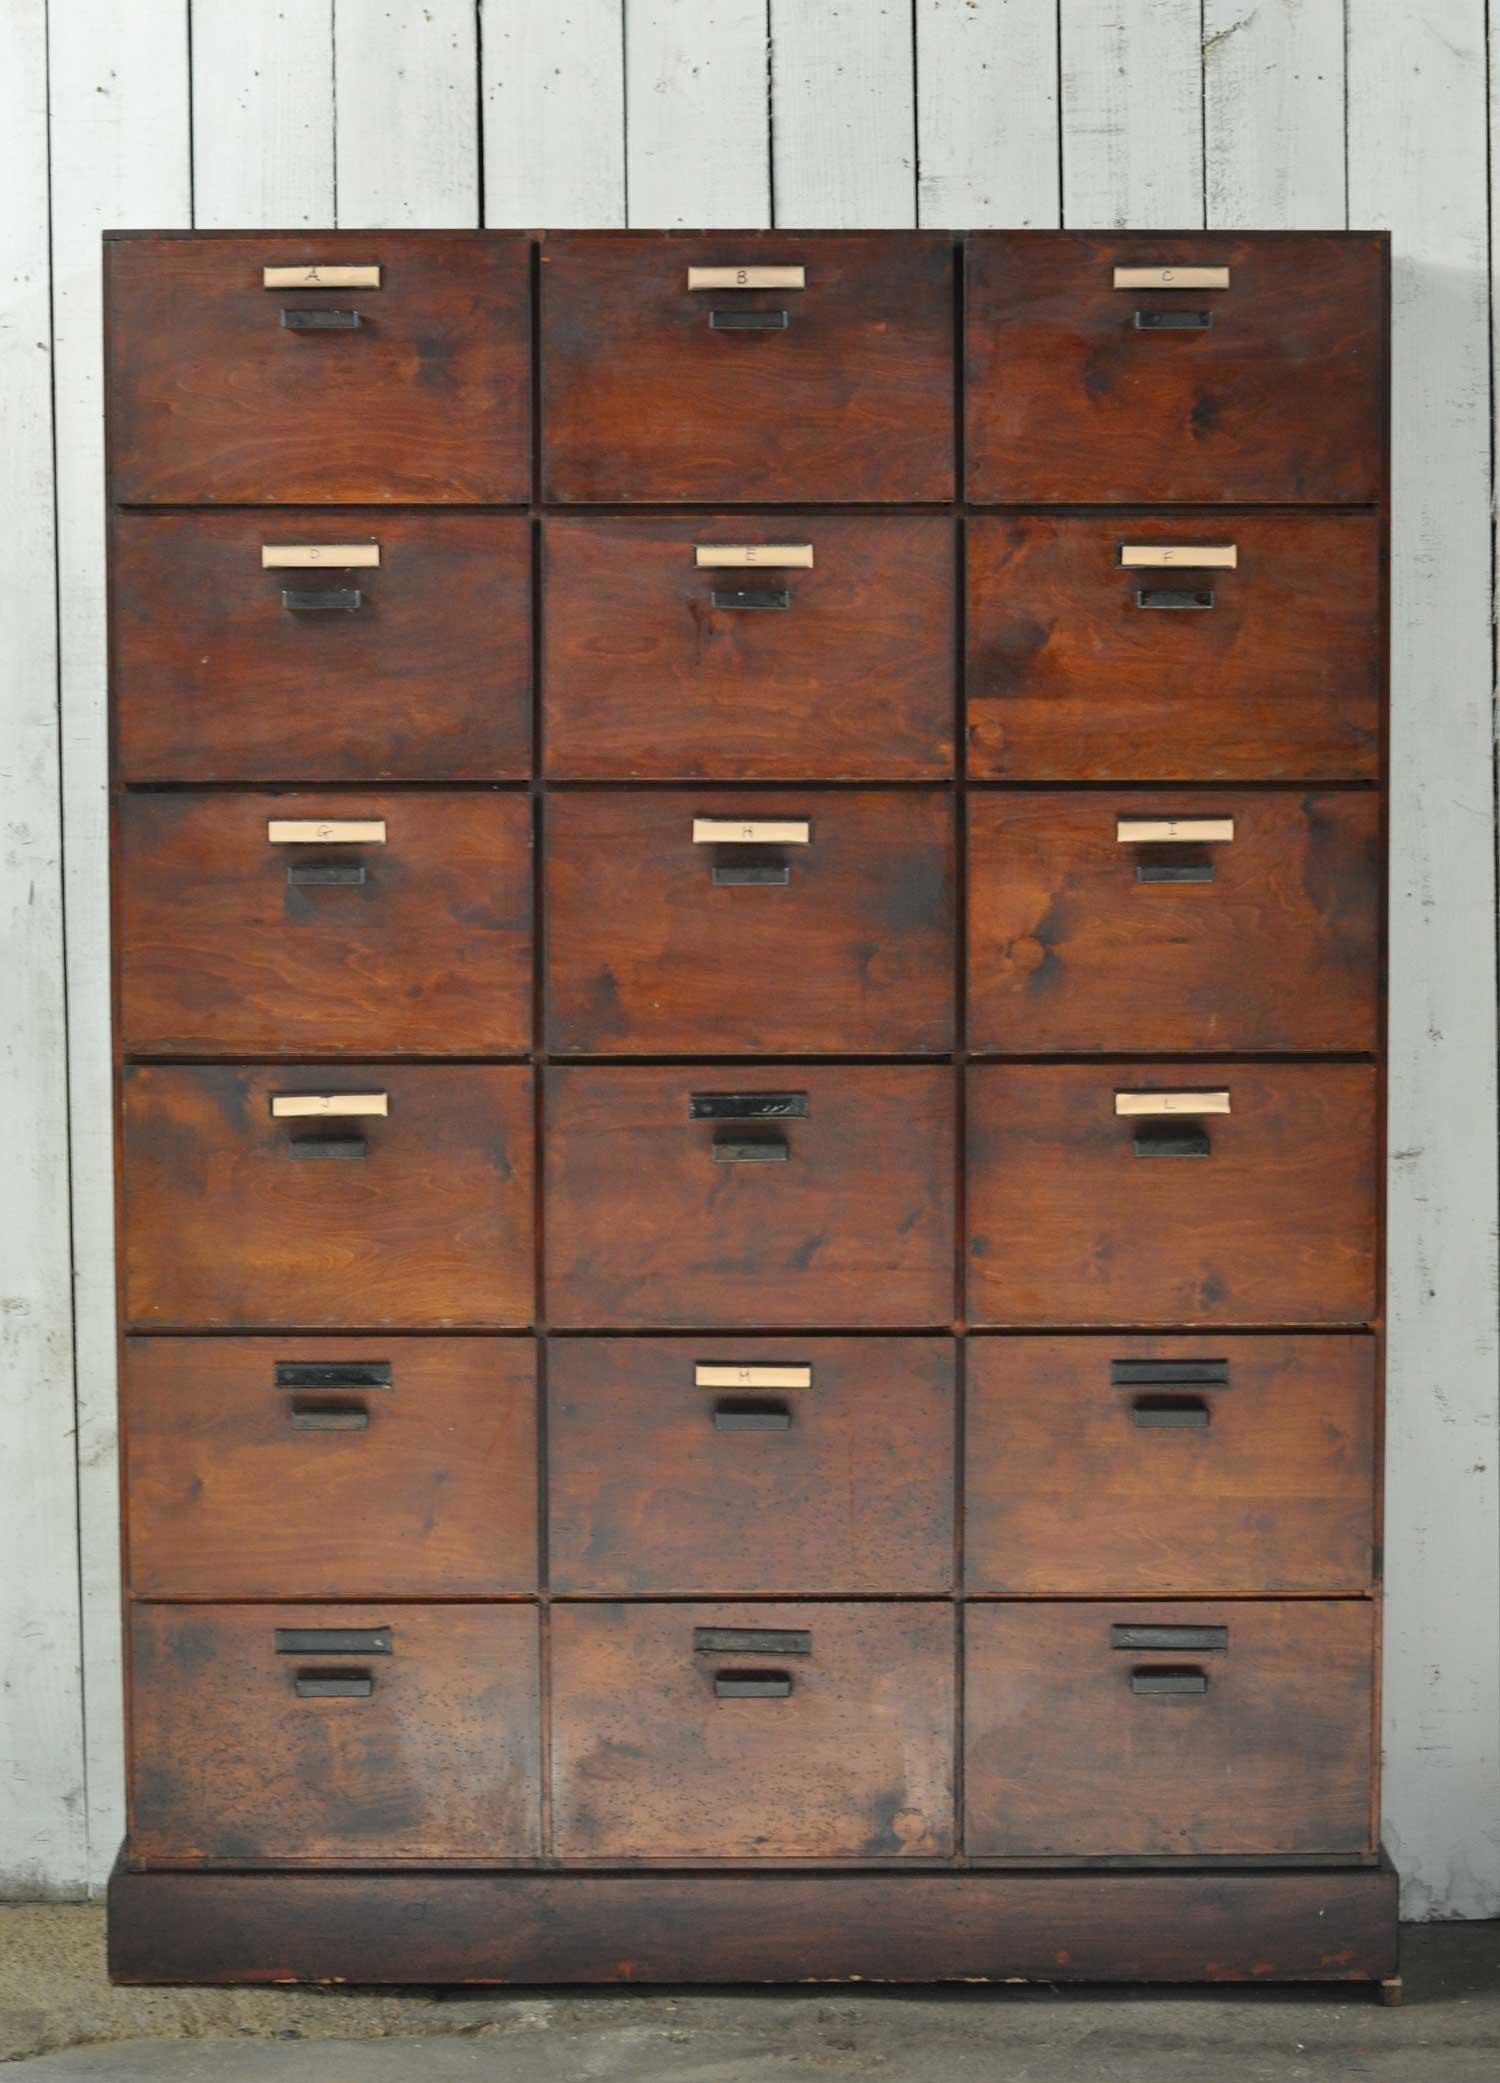 Locker style cabinets